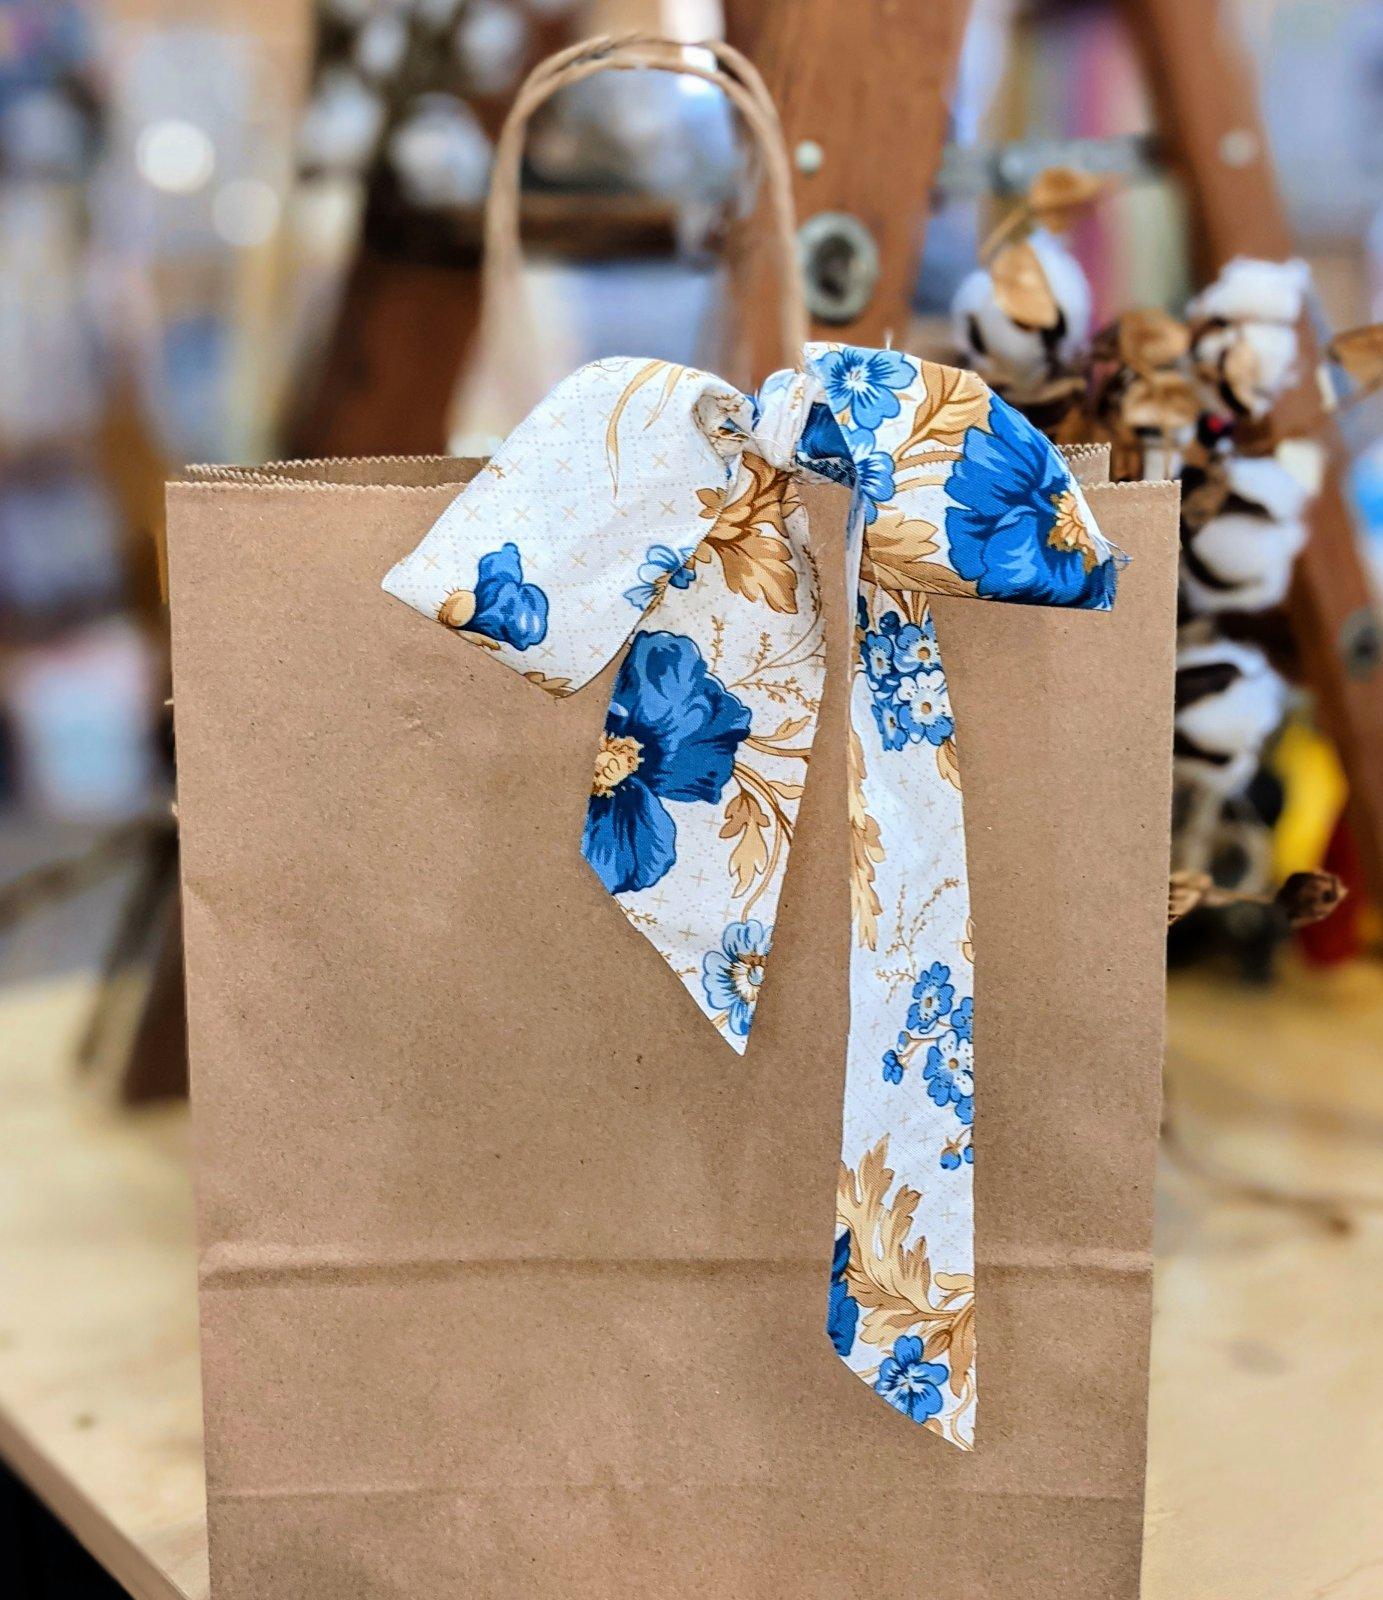 2021 Brown Bag Mystery - Vintage Blue